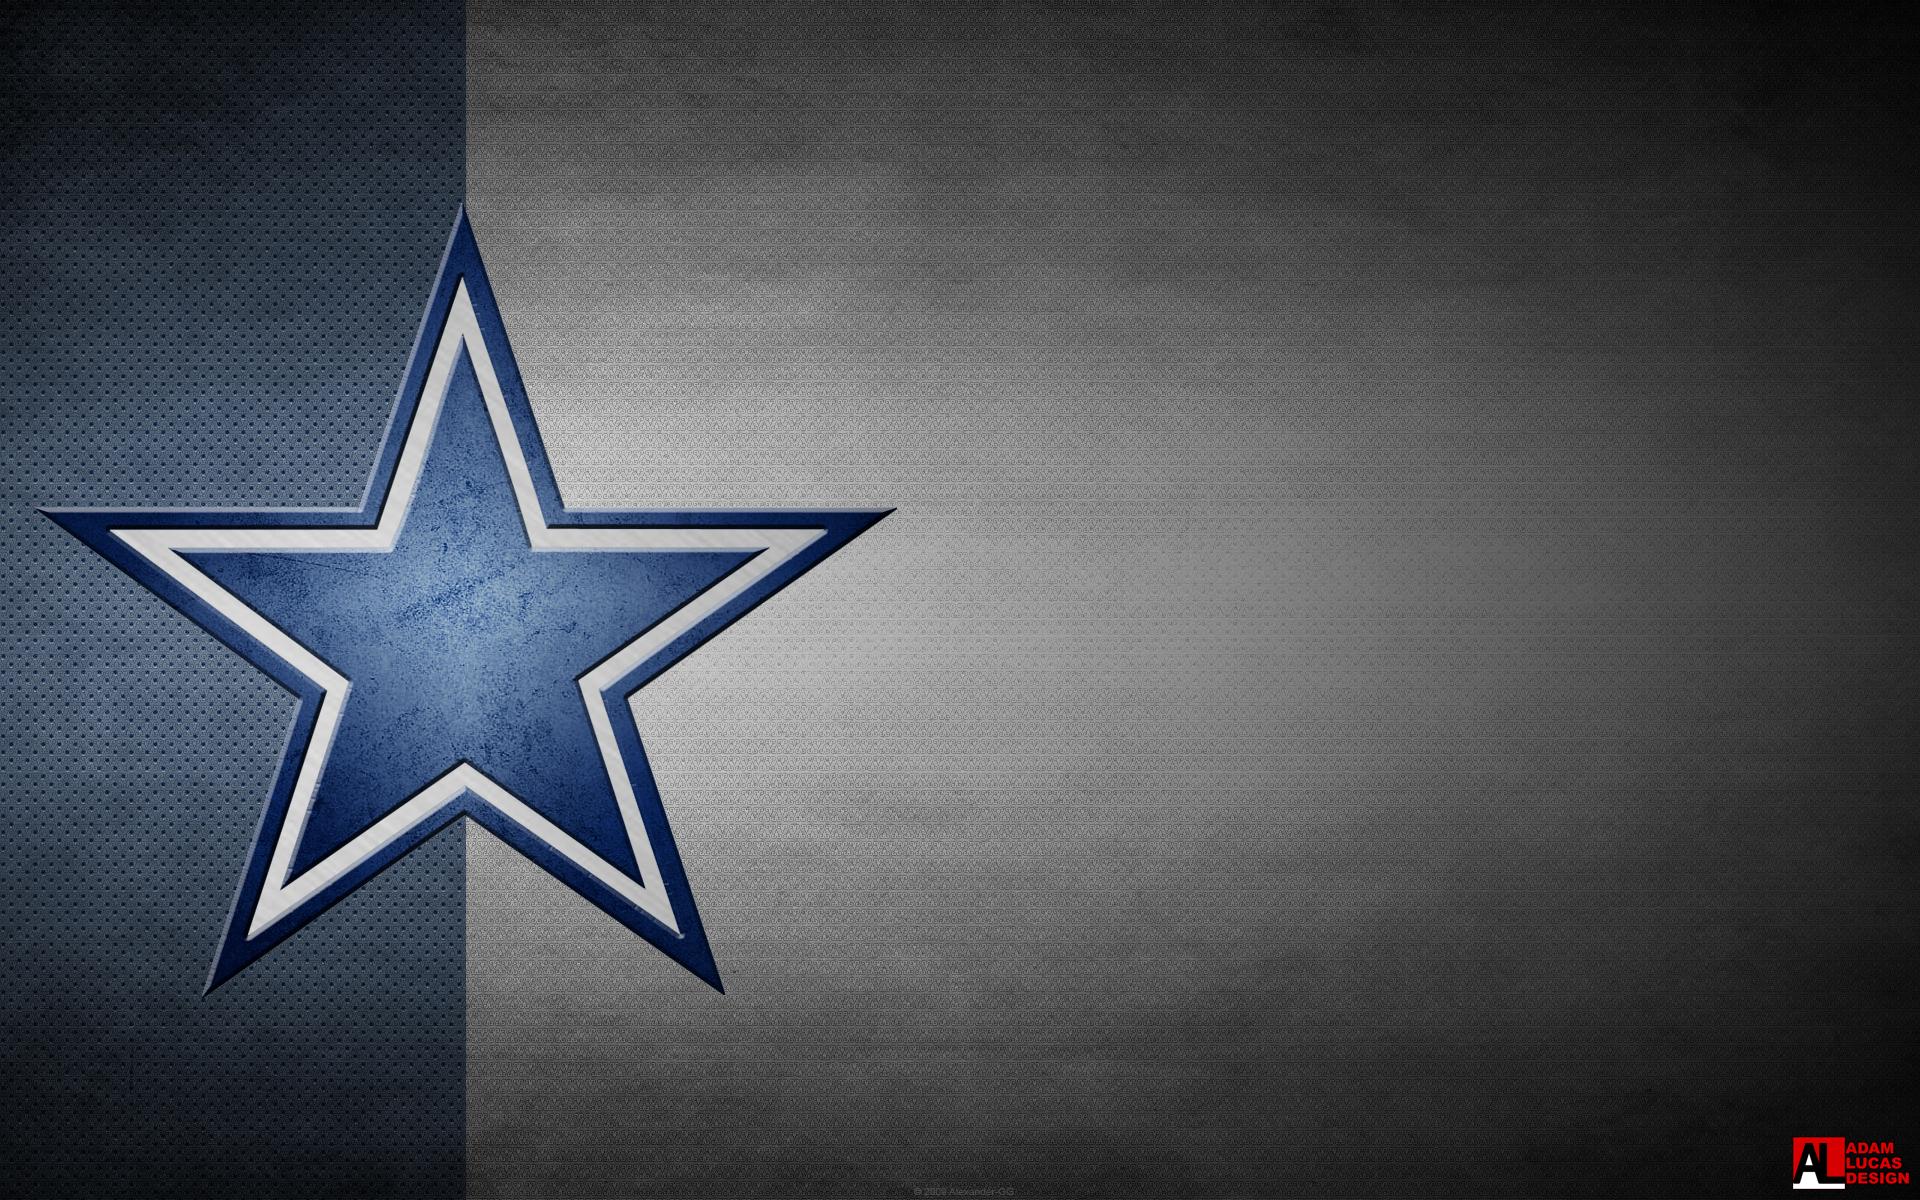 Dallas Cowboy wallpaper 1920x1200 34814 1920x1200